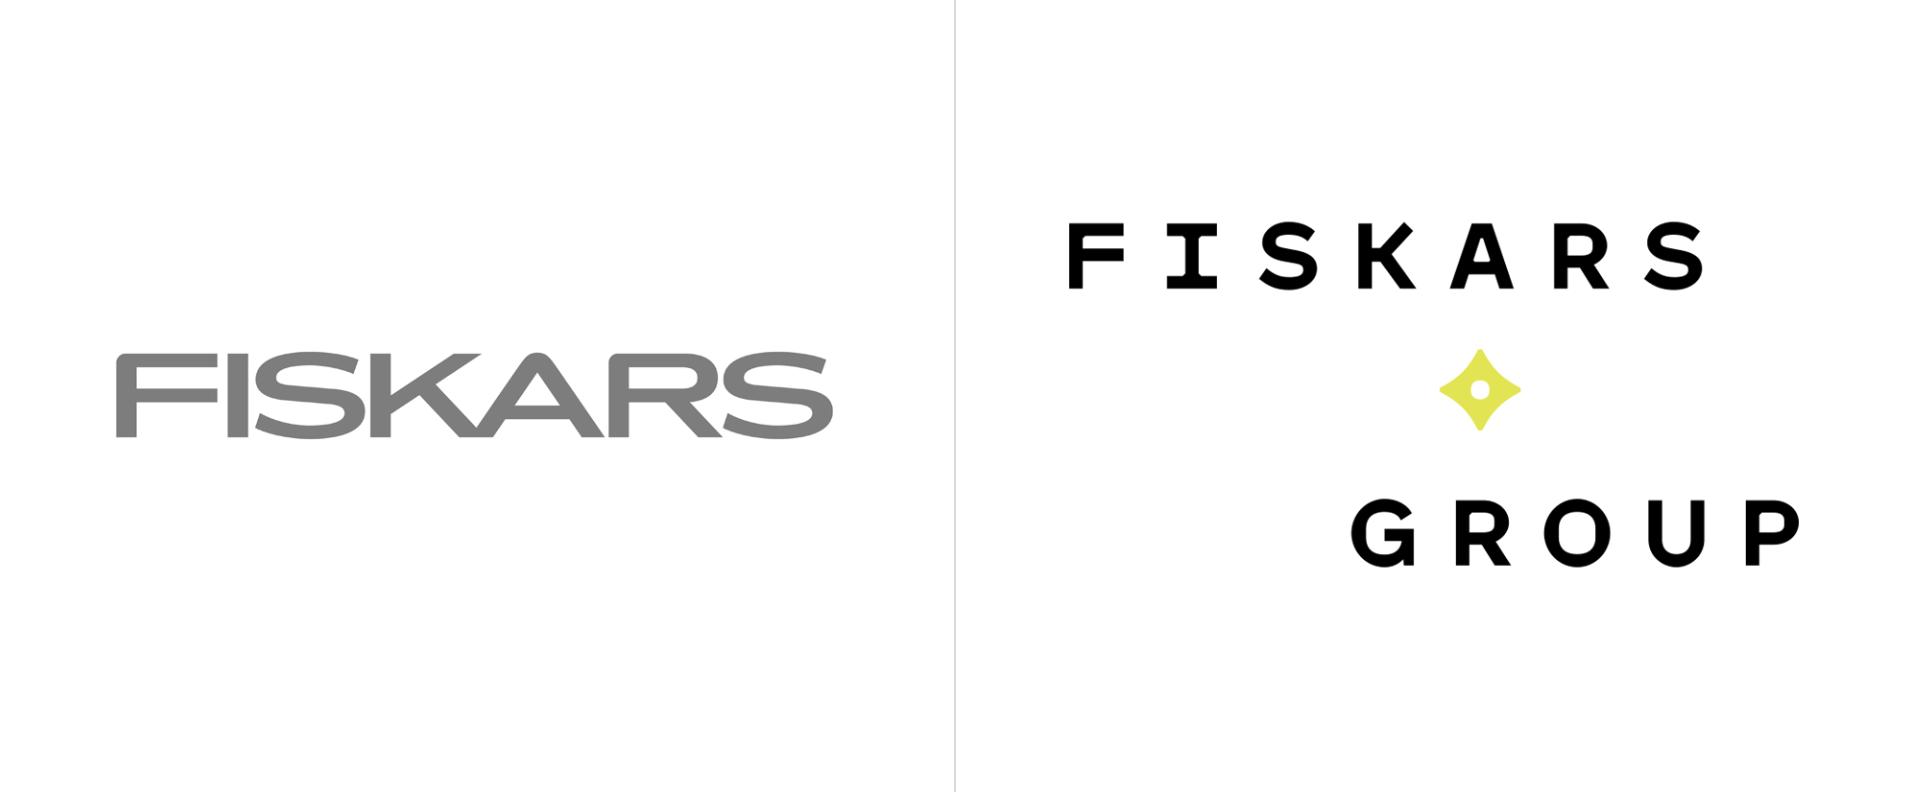 Fiskars Group 启用全新的品牌LOGO和VI形象设计-vi设计